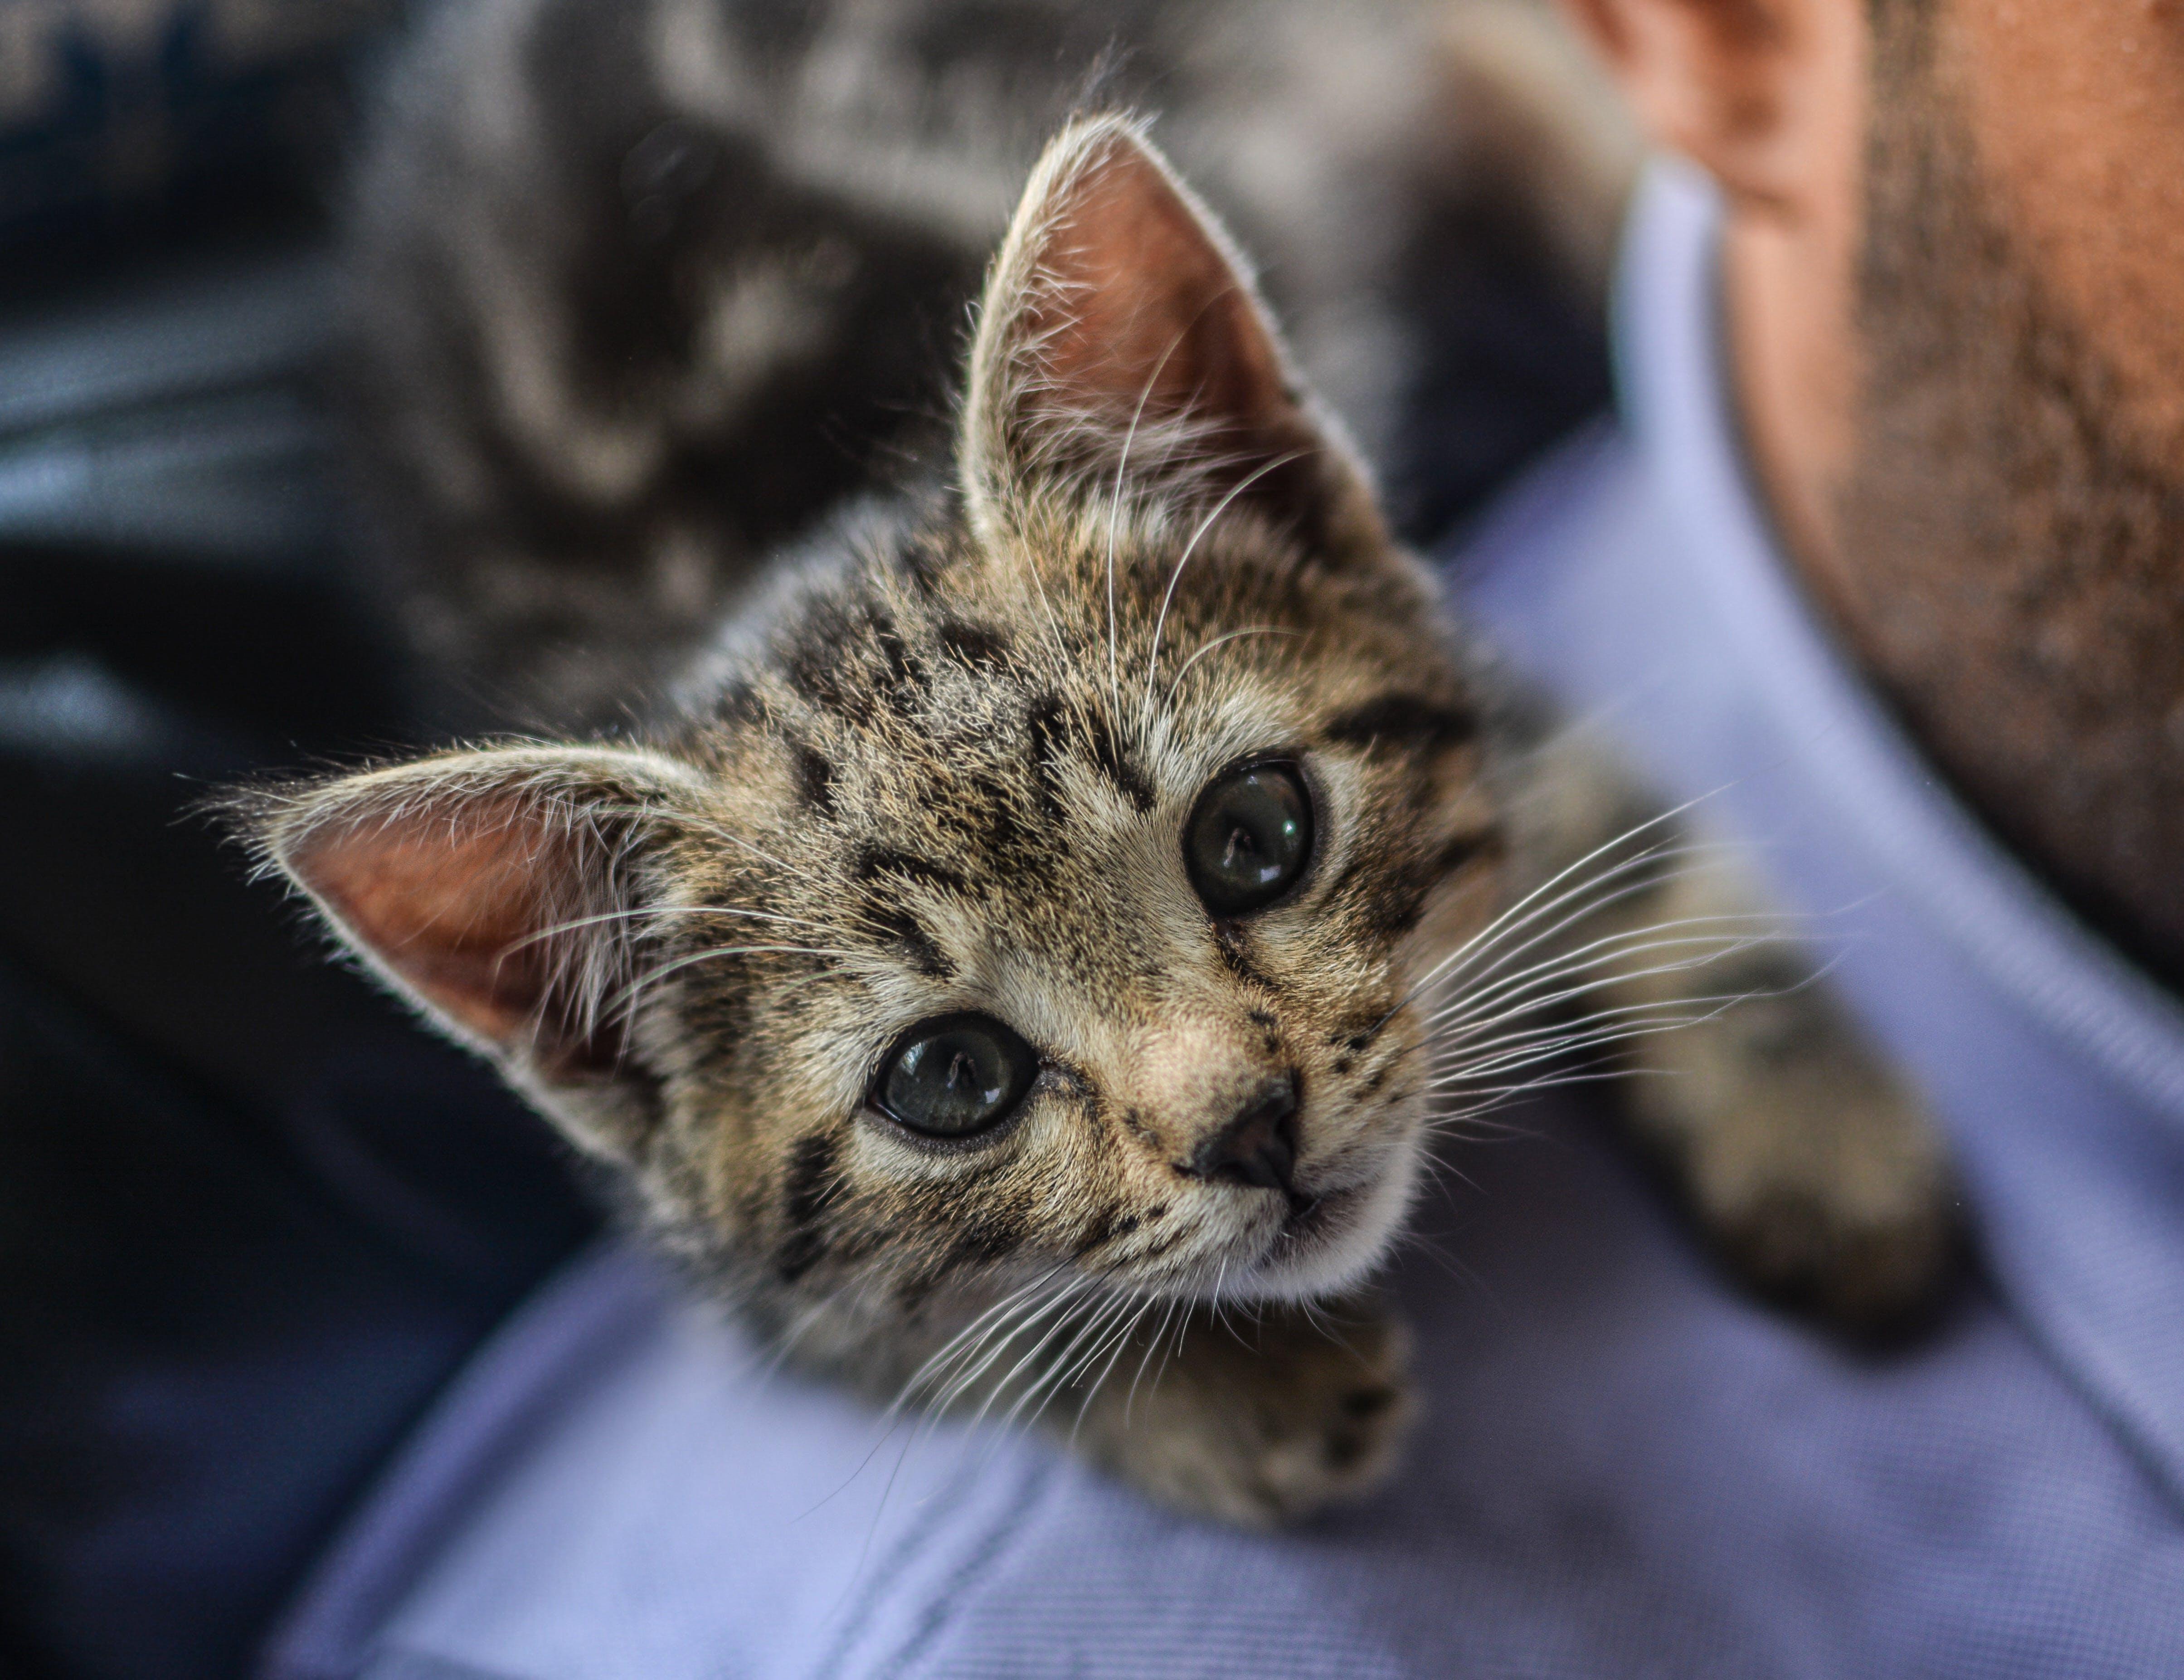 Free stock photo of animal, pet, fur, young